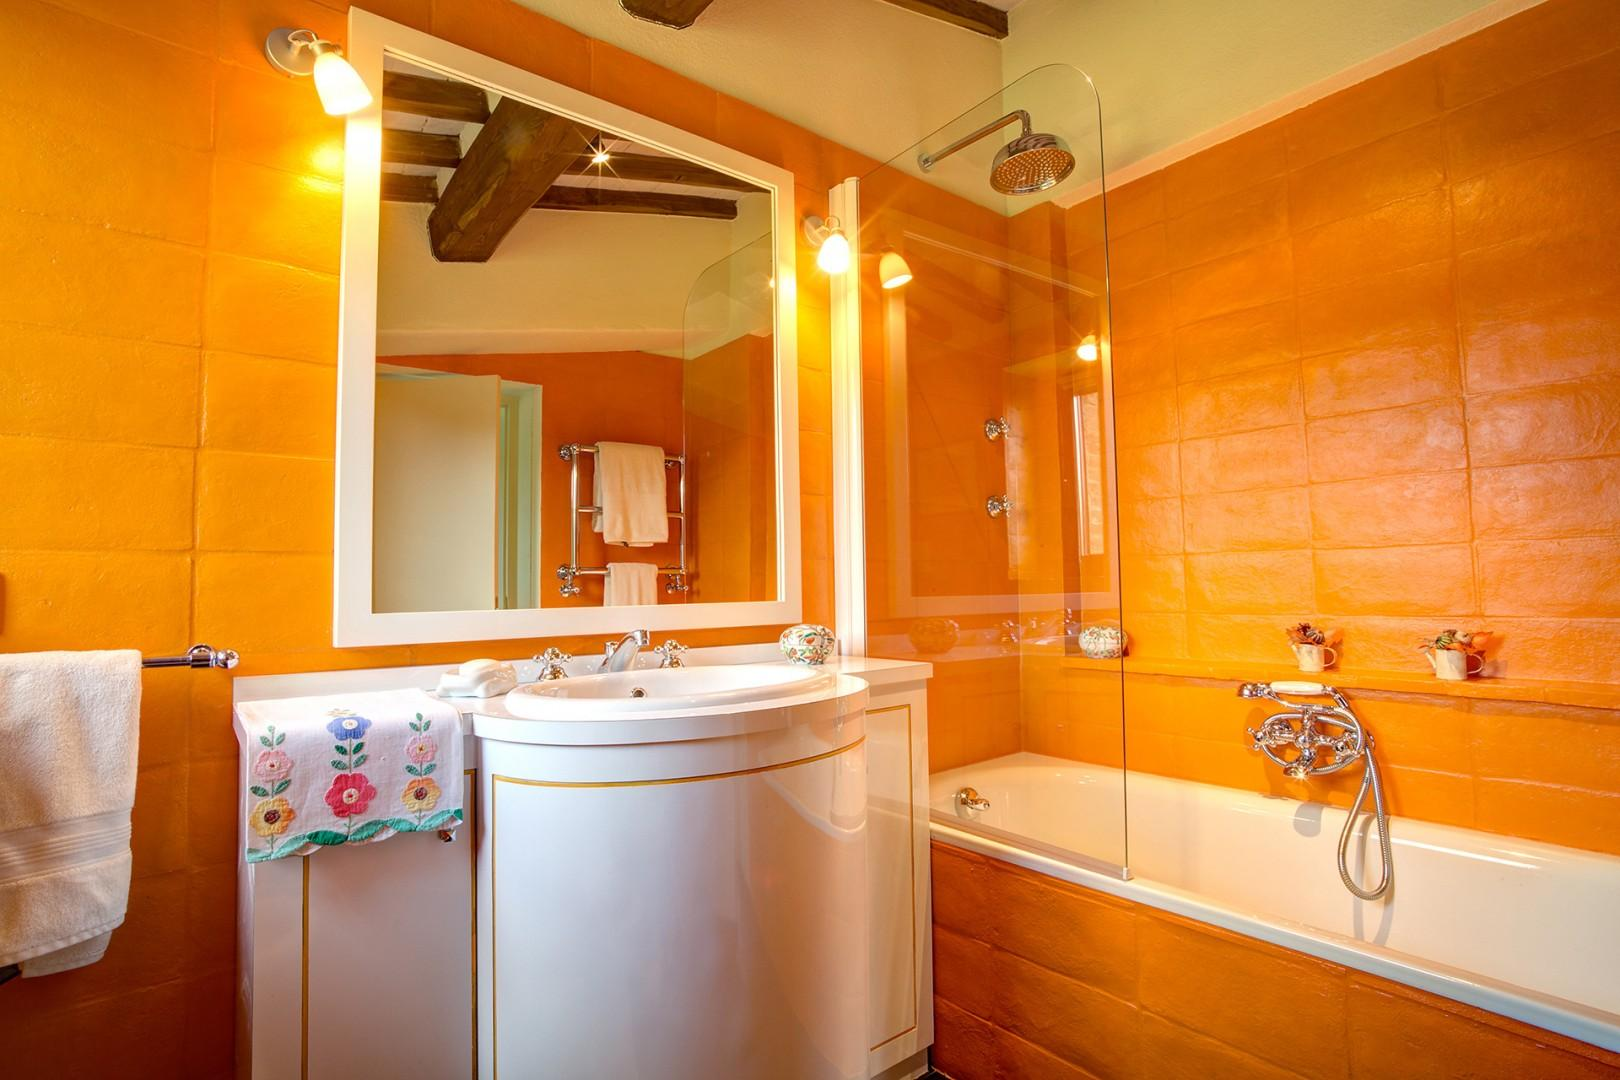 This bathroom has a combination bathtub/shower with rainfall showerhead.